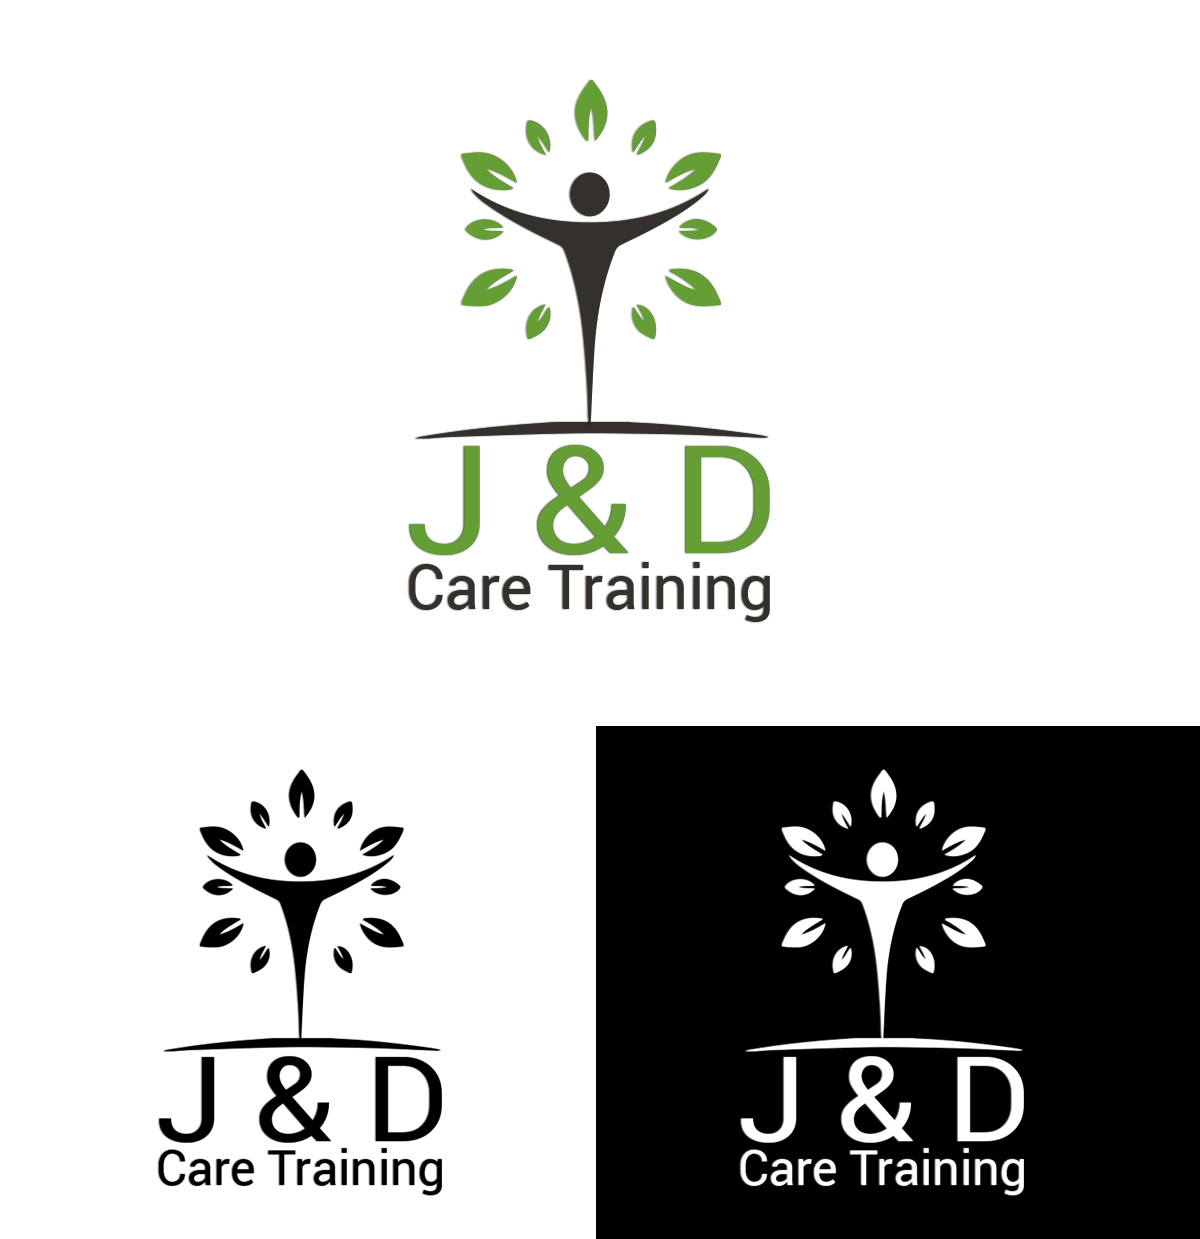 J&D Care Training